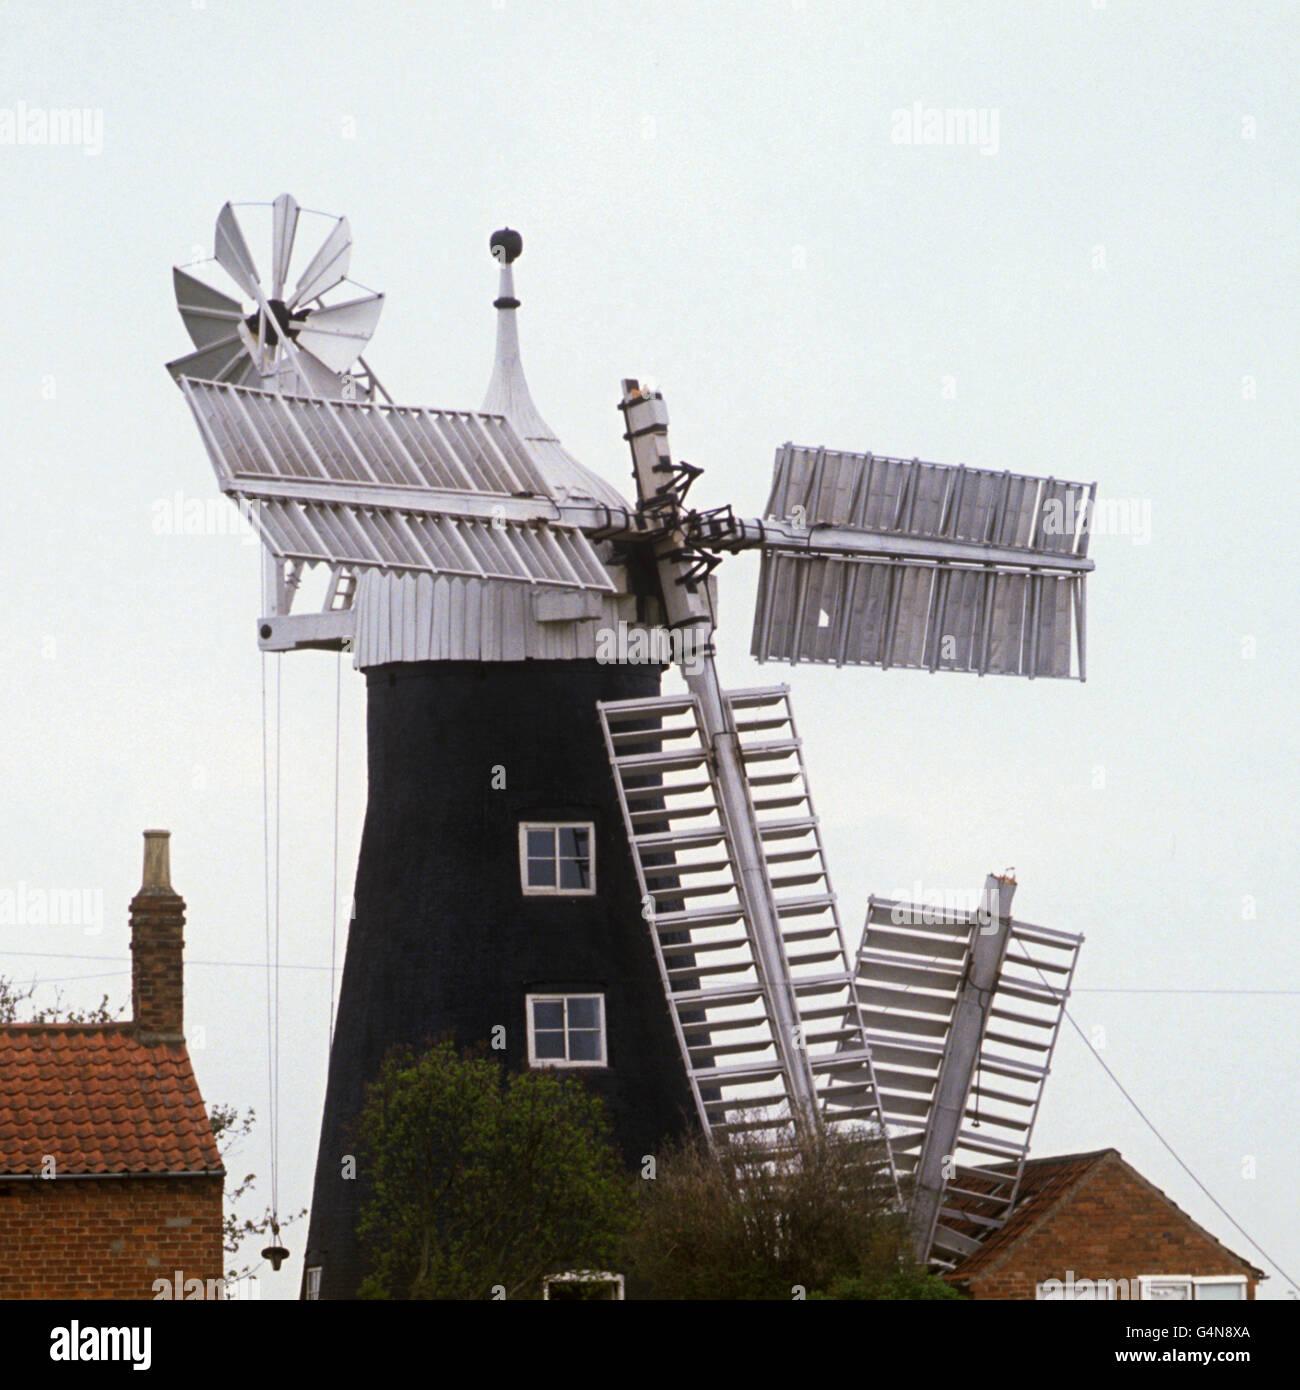 Buildings & Landmarks - North Leverton Windmill - Retford, Nottinghamshire Stock Photo